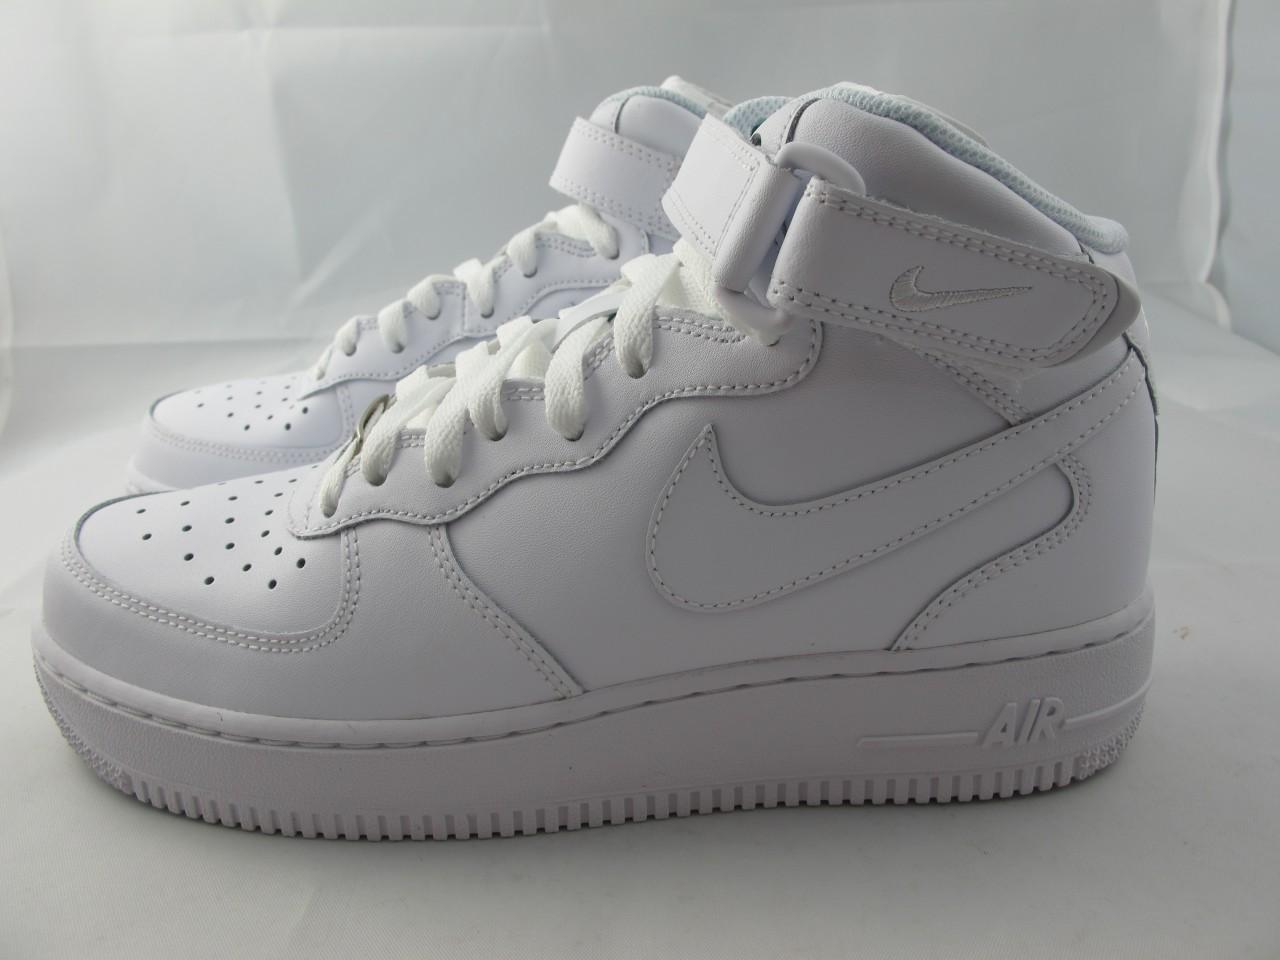 new juniors nike air force 1 mid 314195 113 white white ebay. Black Bedroom Furniture Sets. Home Design Ideas